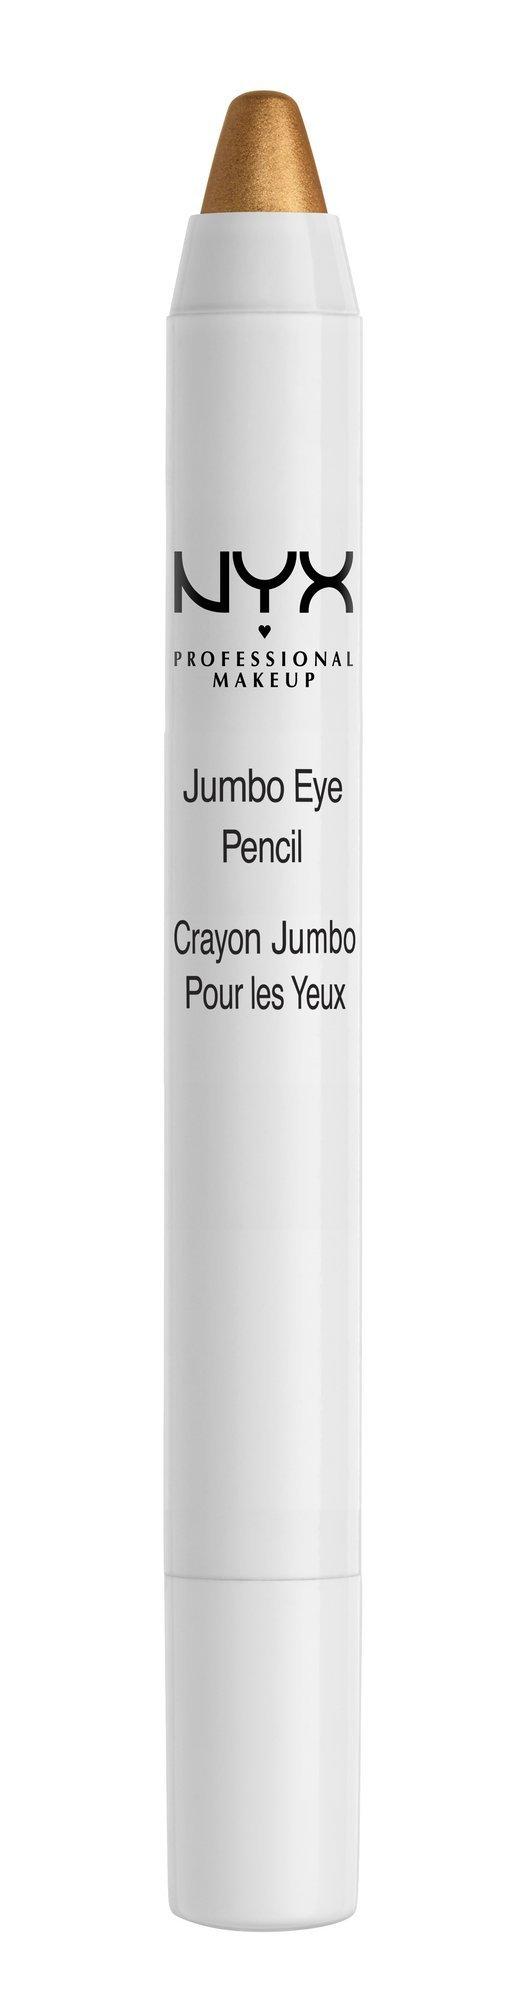 NYX Jumbo Eye Pencil -Color 612 - Gold